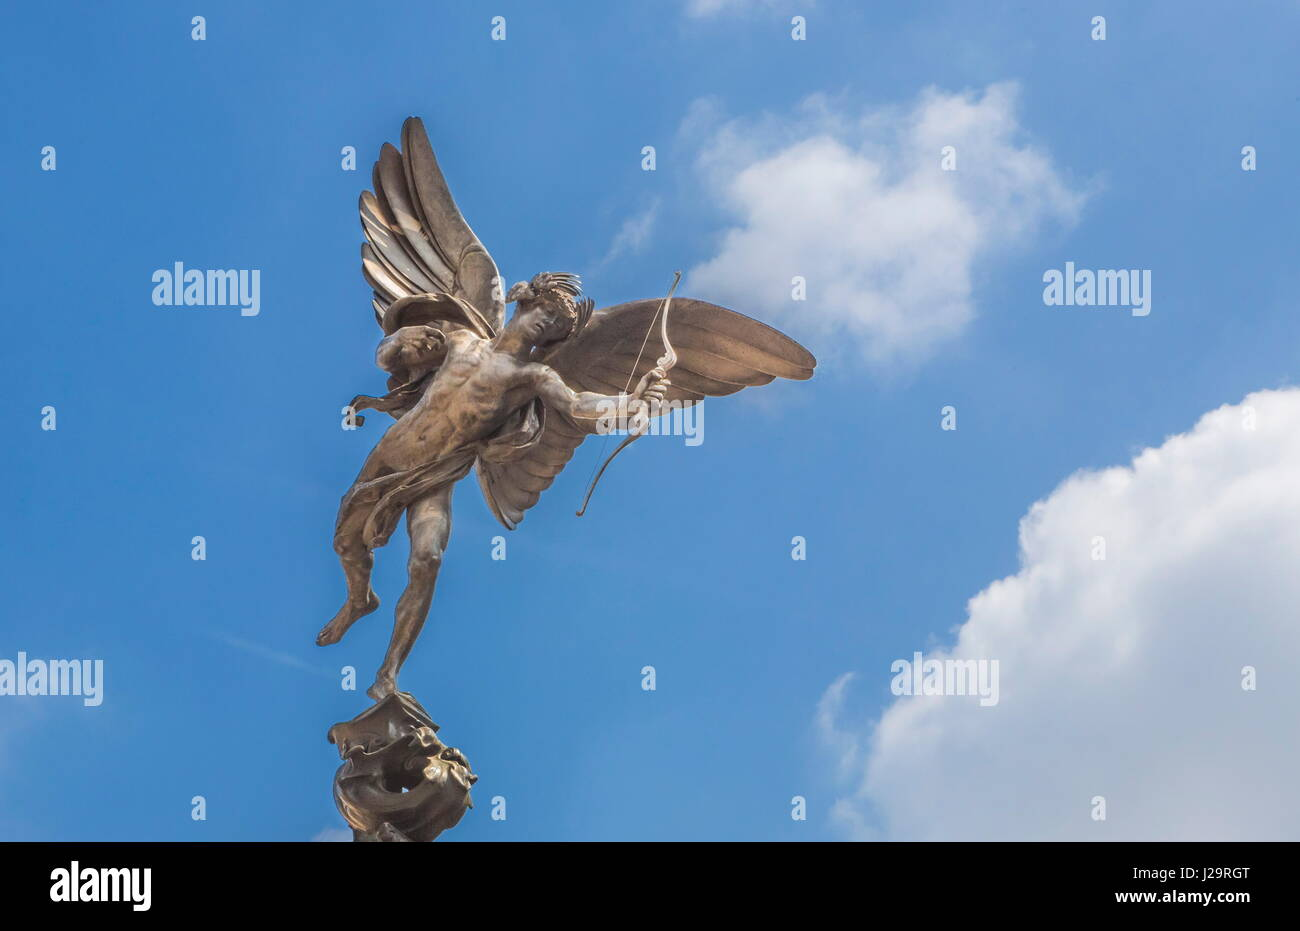 UK, London, Picadilly Circus, - Stock Image